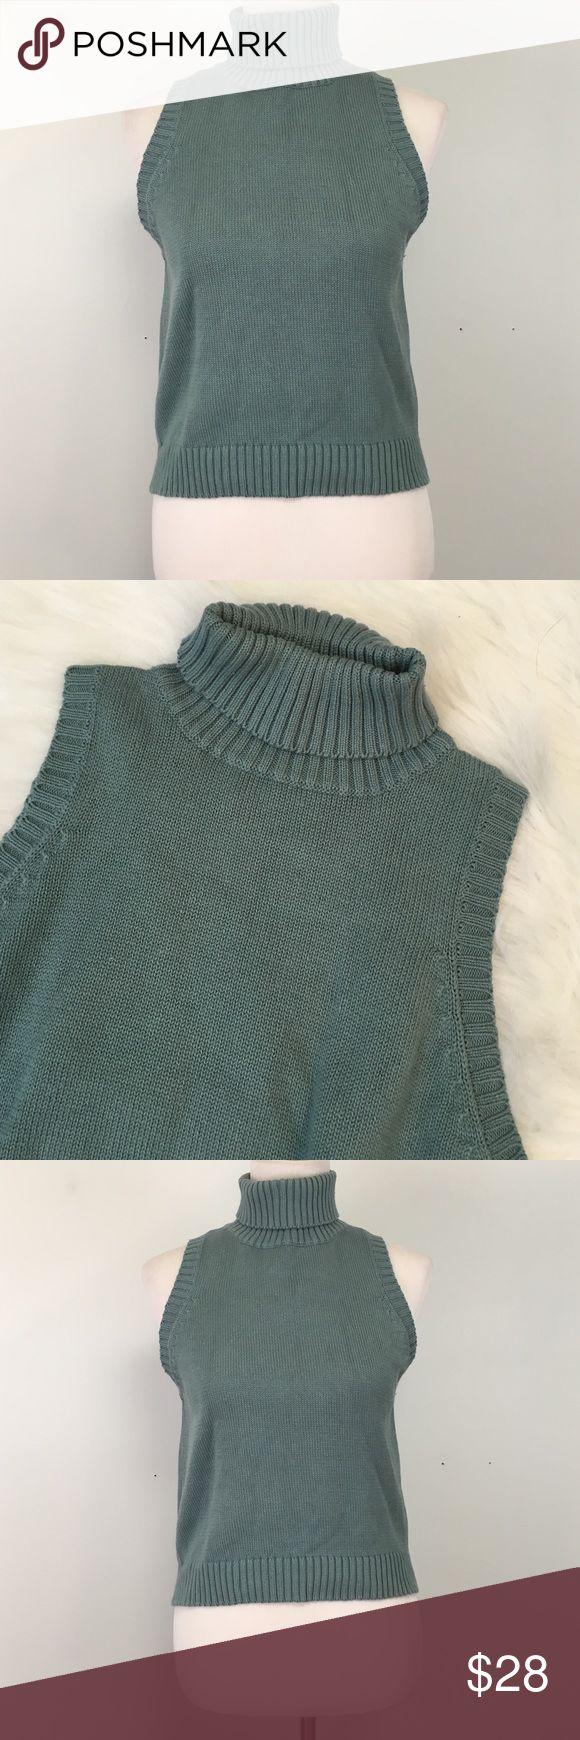 Turtle Neck Cropped Sleeveless Sweater Turtleneck Sleeveless Sweater Tarazzia Design Studio Sweaters Cowl & Turtlenecks